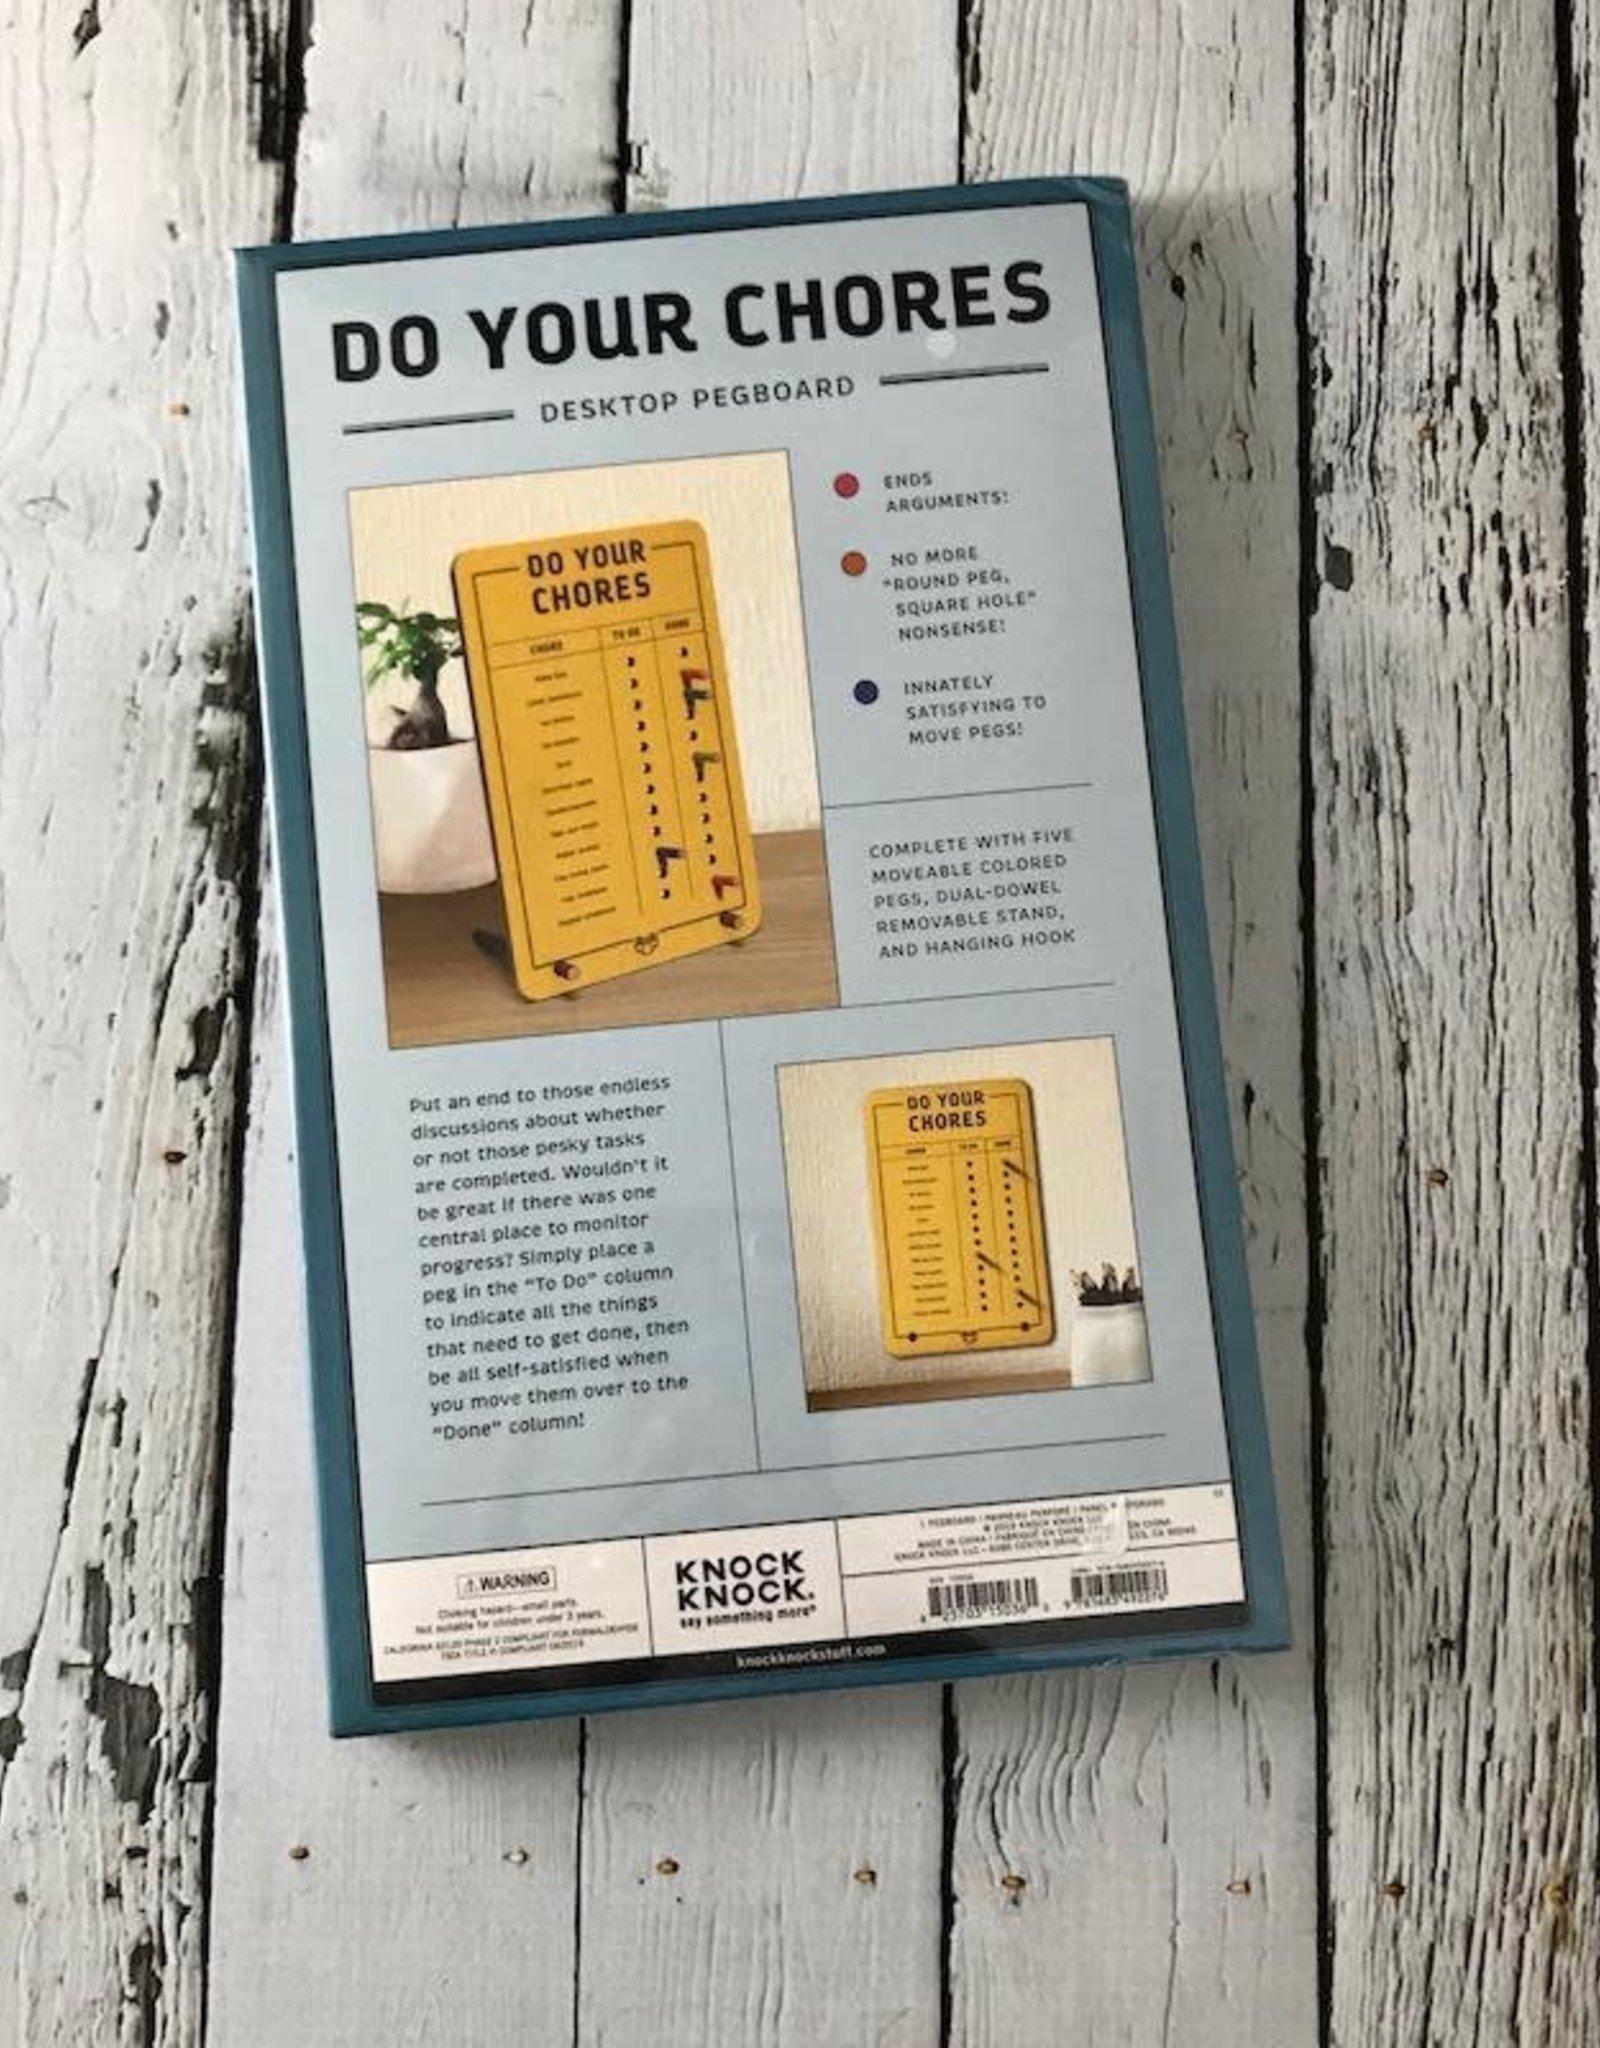 KnockKnock Do Your Chores Pegboard